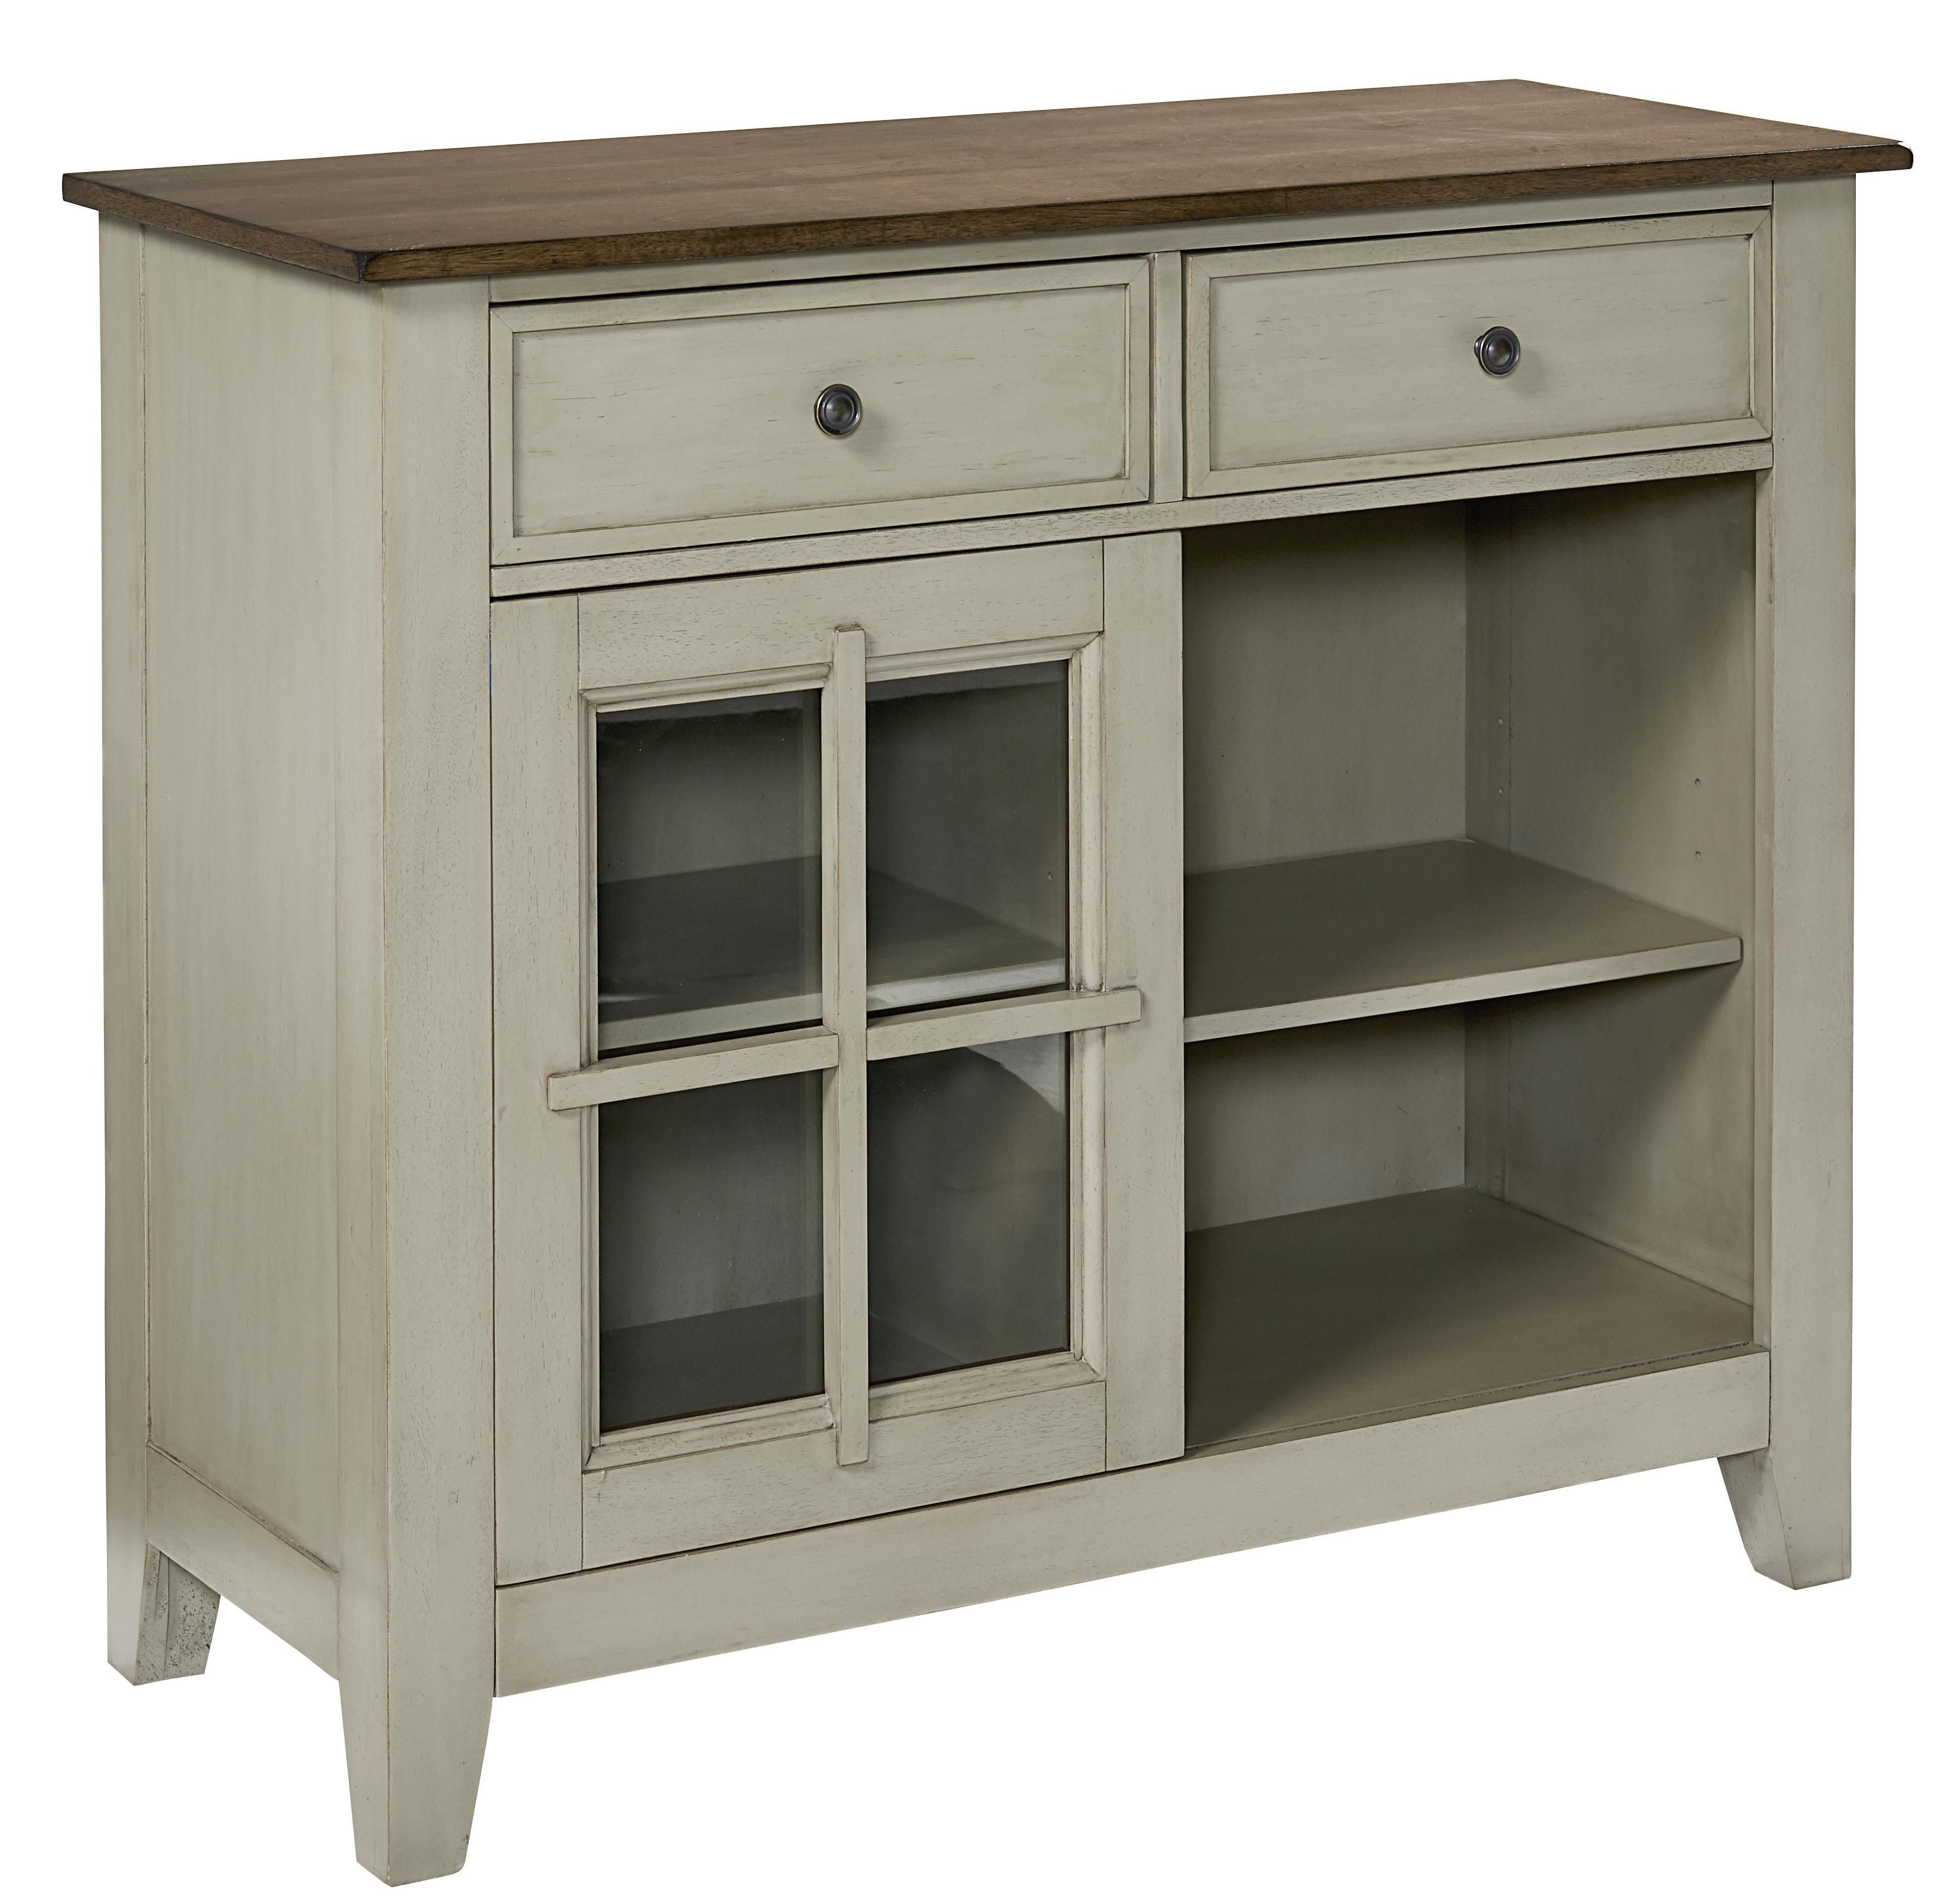 Pendleton sage sideboard by standard furniture 39800